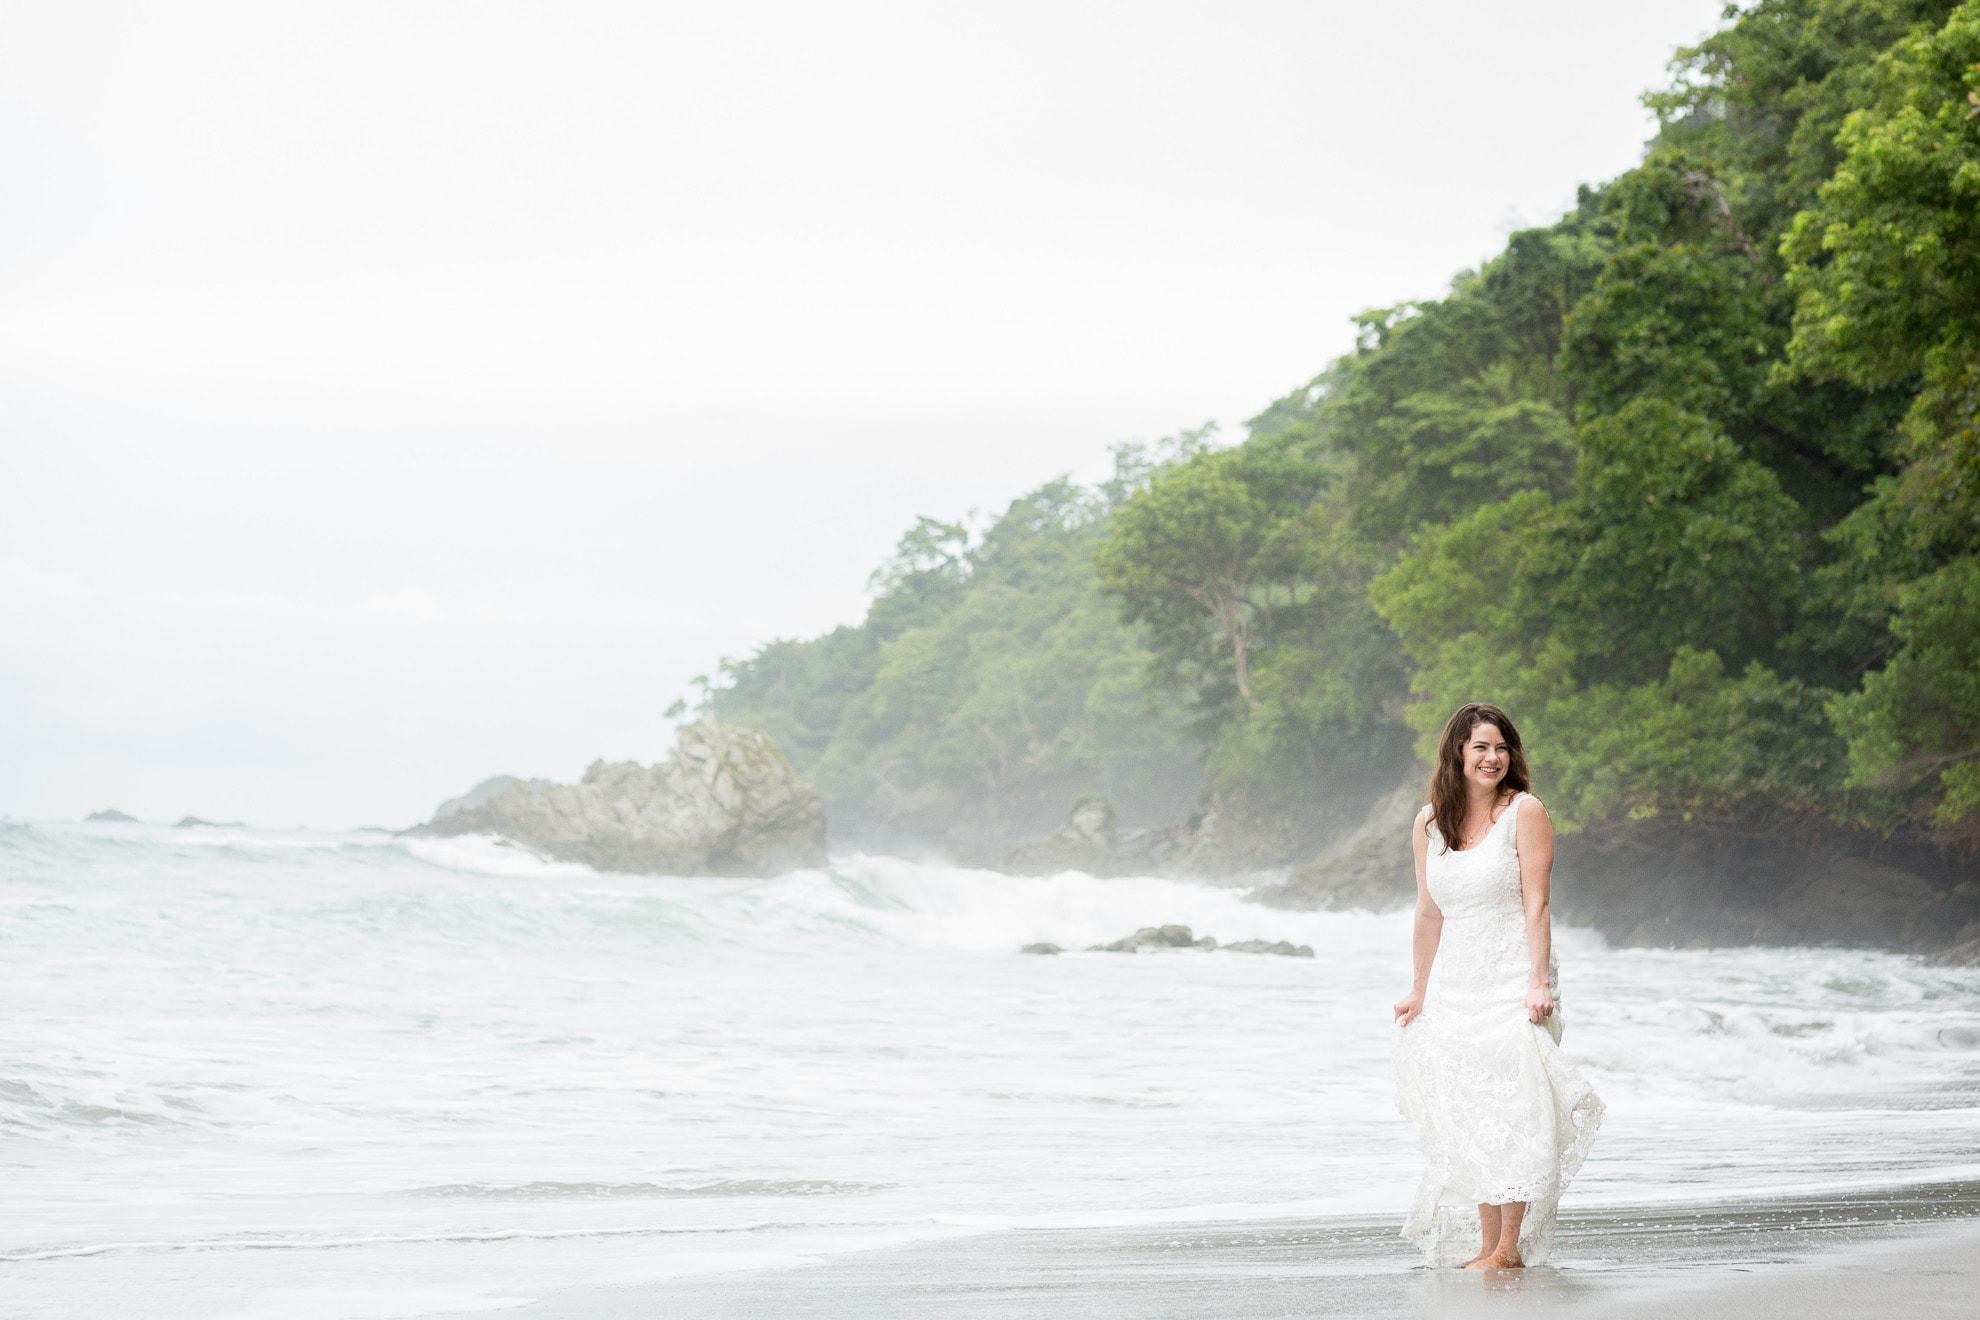 Backdrops in Costa Rica Weddings